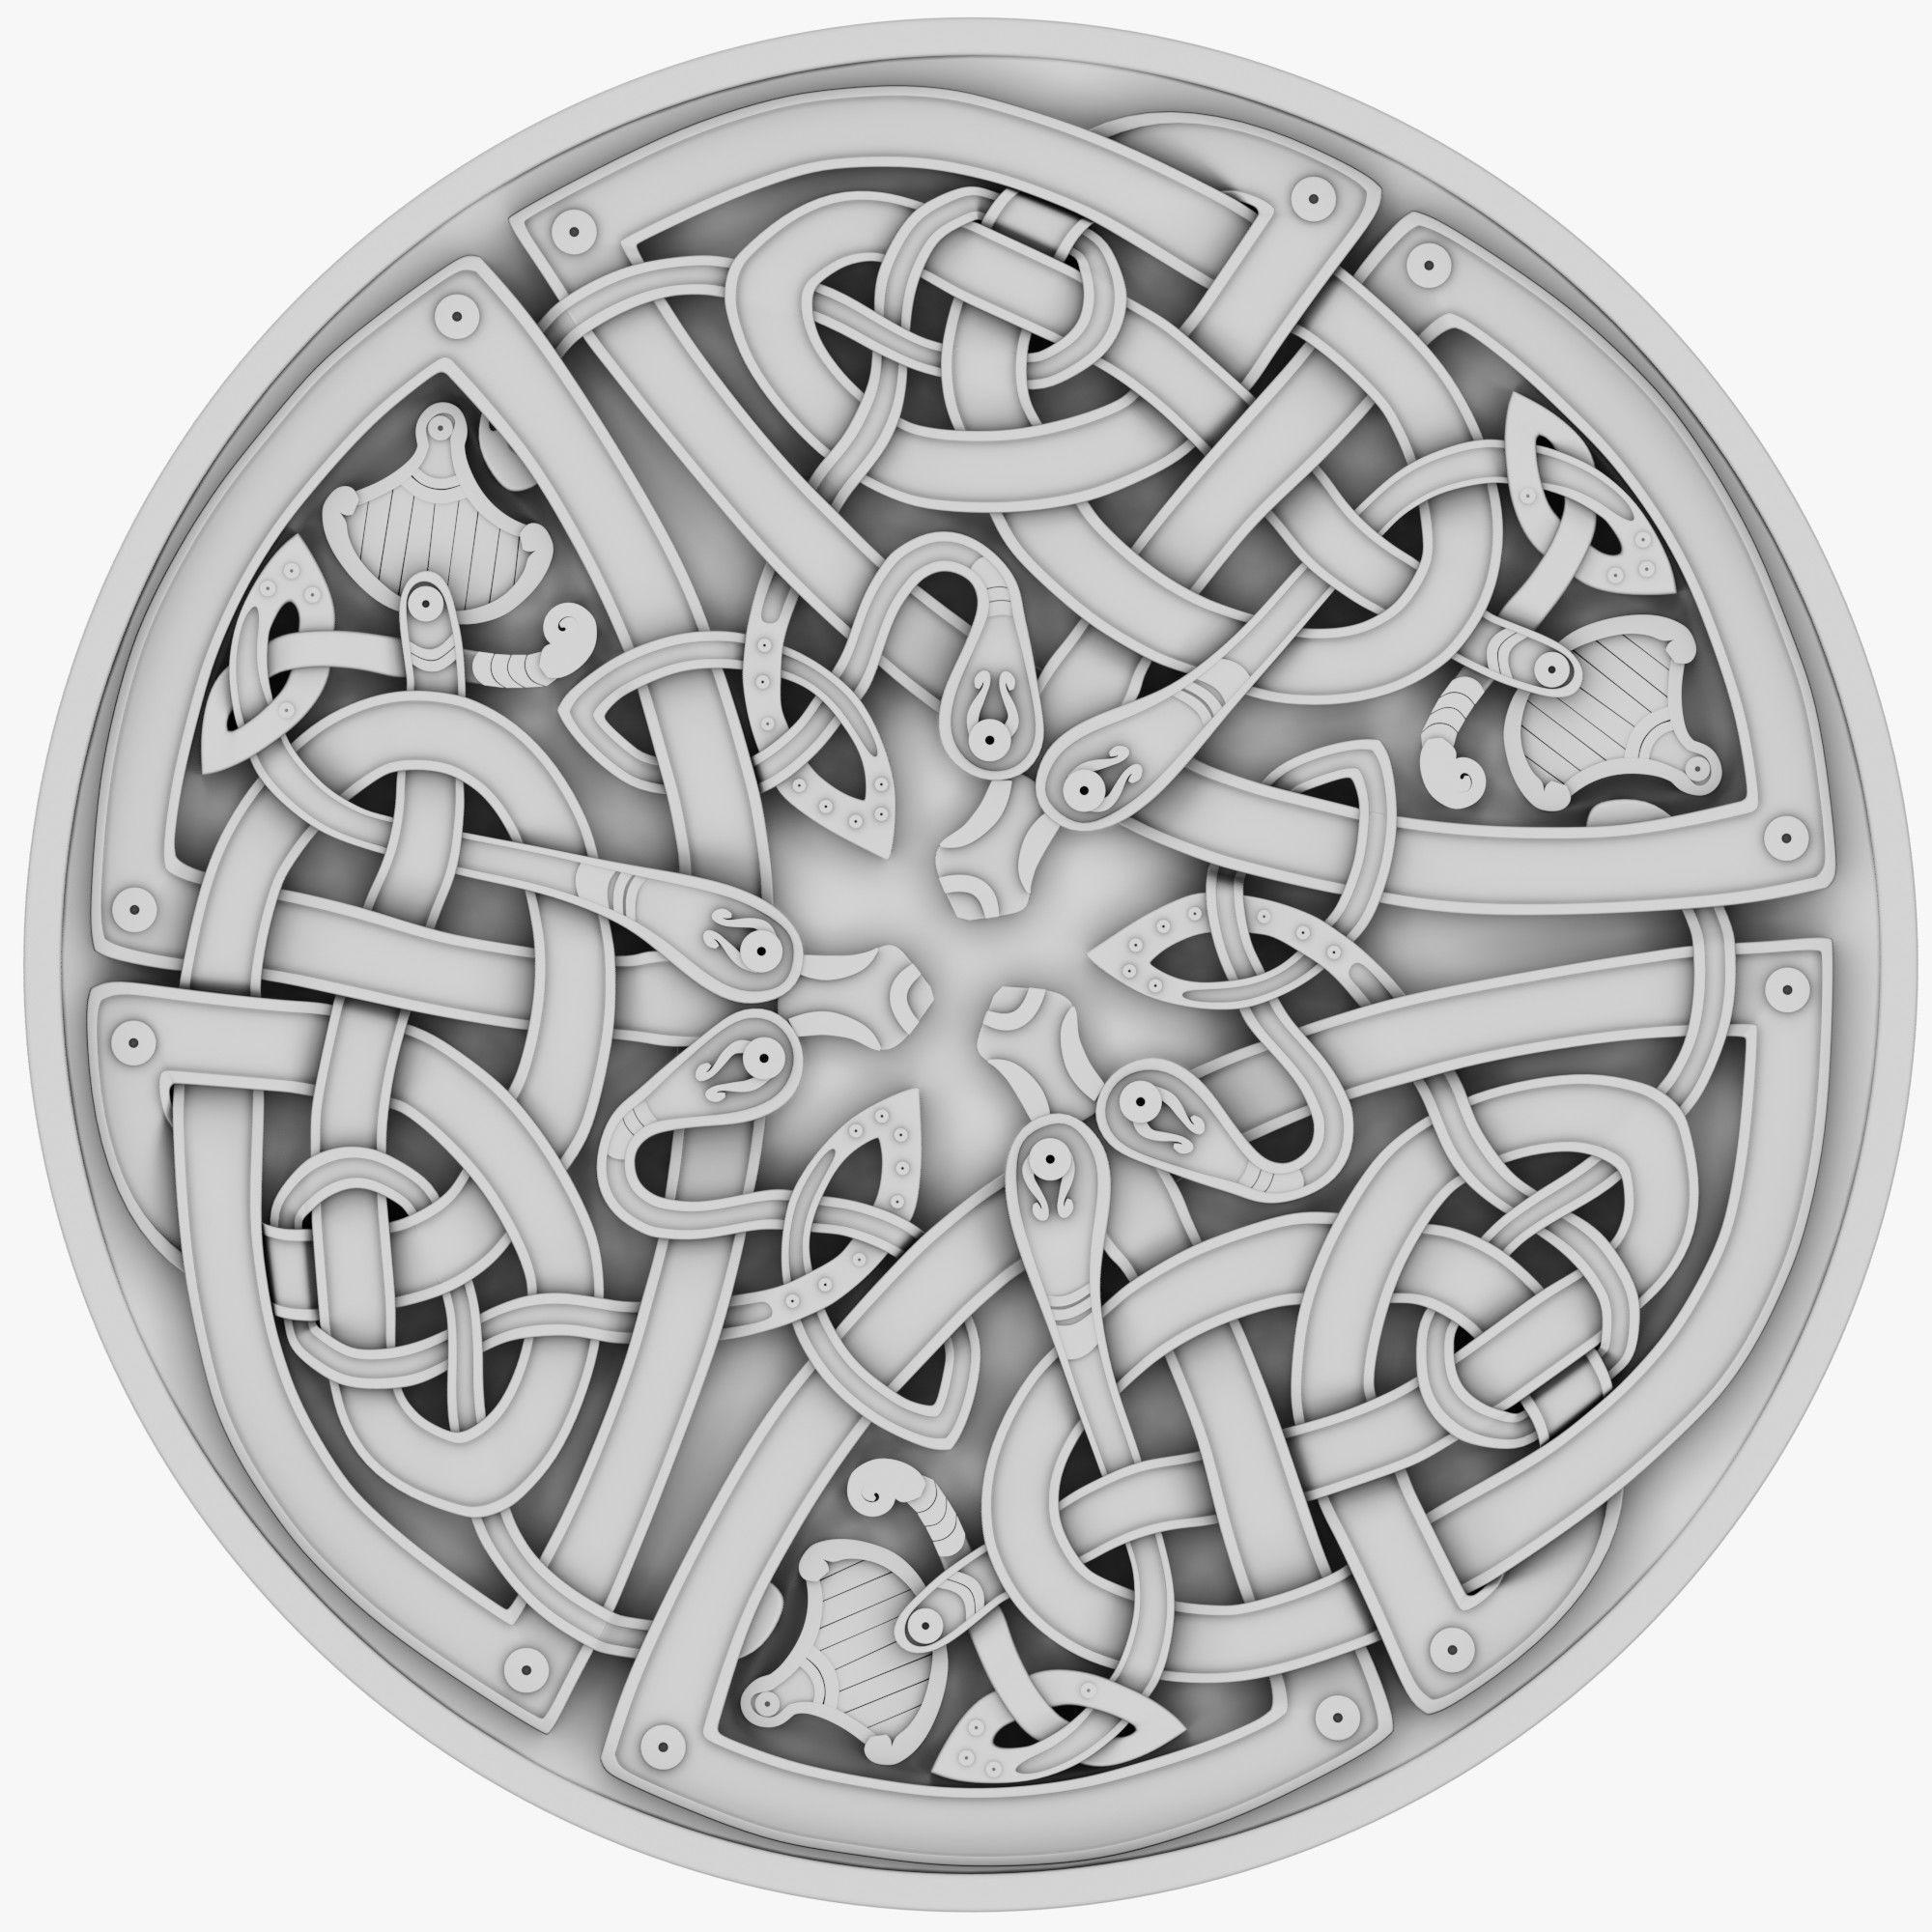 Celtic Ornament 25